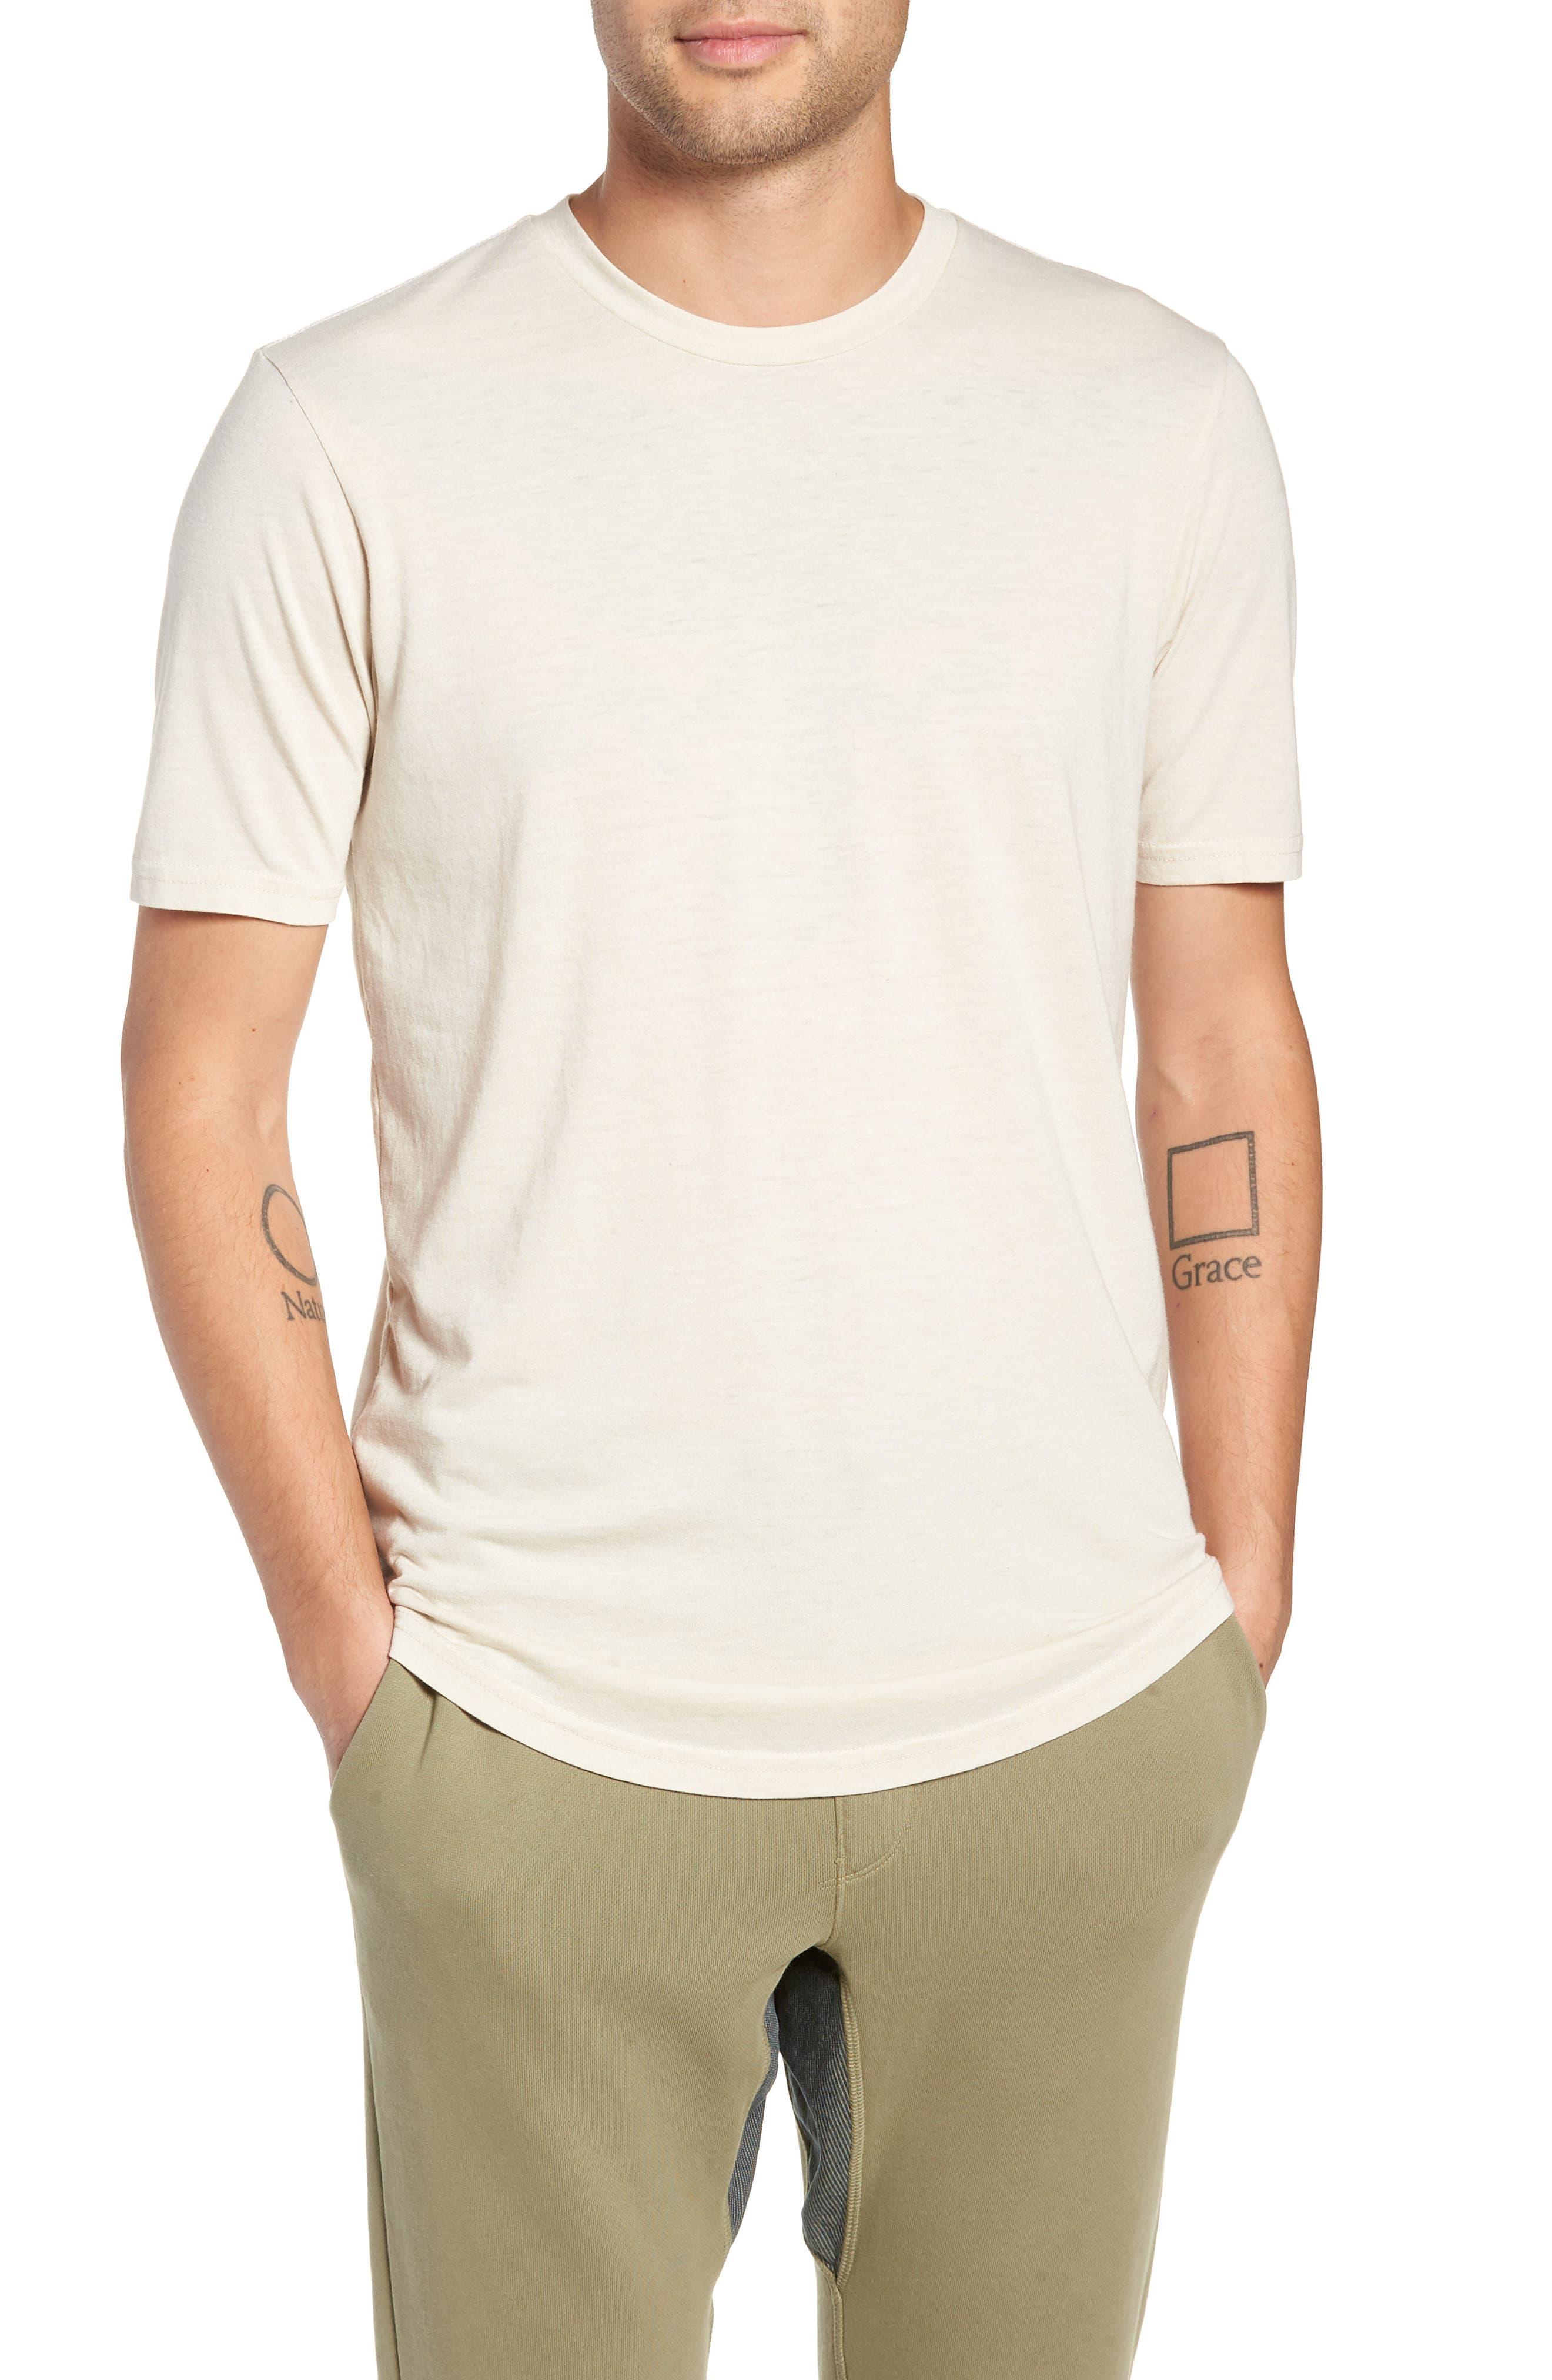 GOODLIFE, Scallop Triblend Crewneck T-Shirt, Main thumbnail 1, color, OYSTER